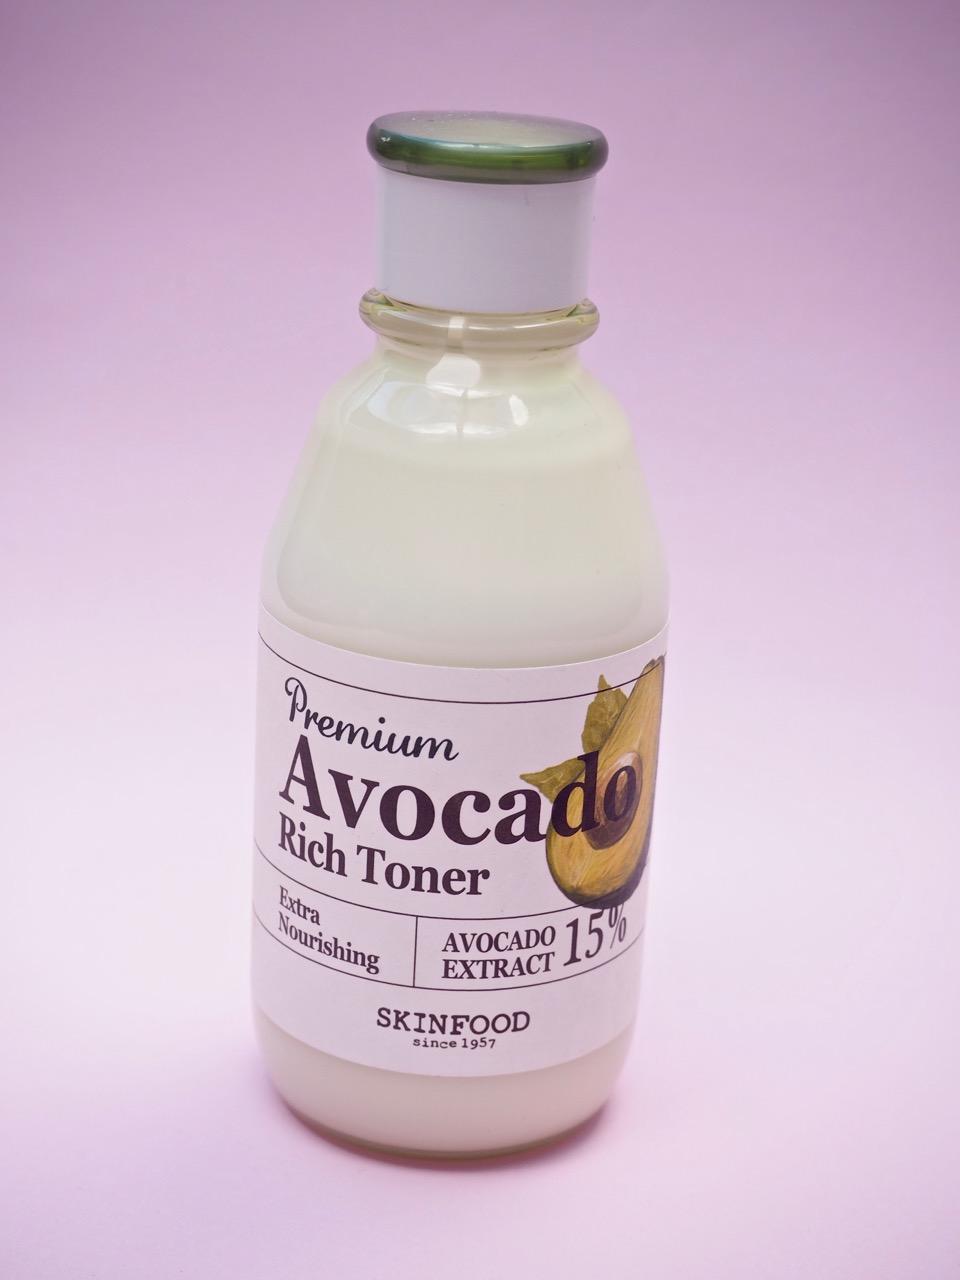 Skinfood Premium Avocado Rich Toner kokemuksia Ostolakossa Virve Vee